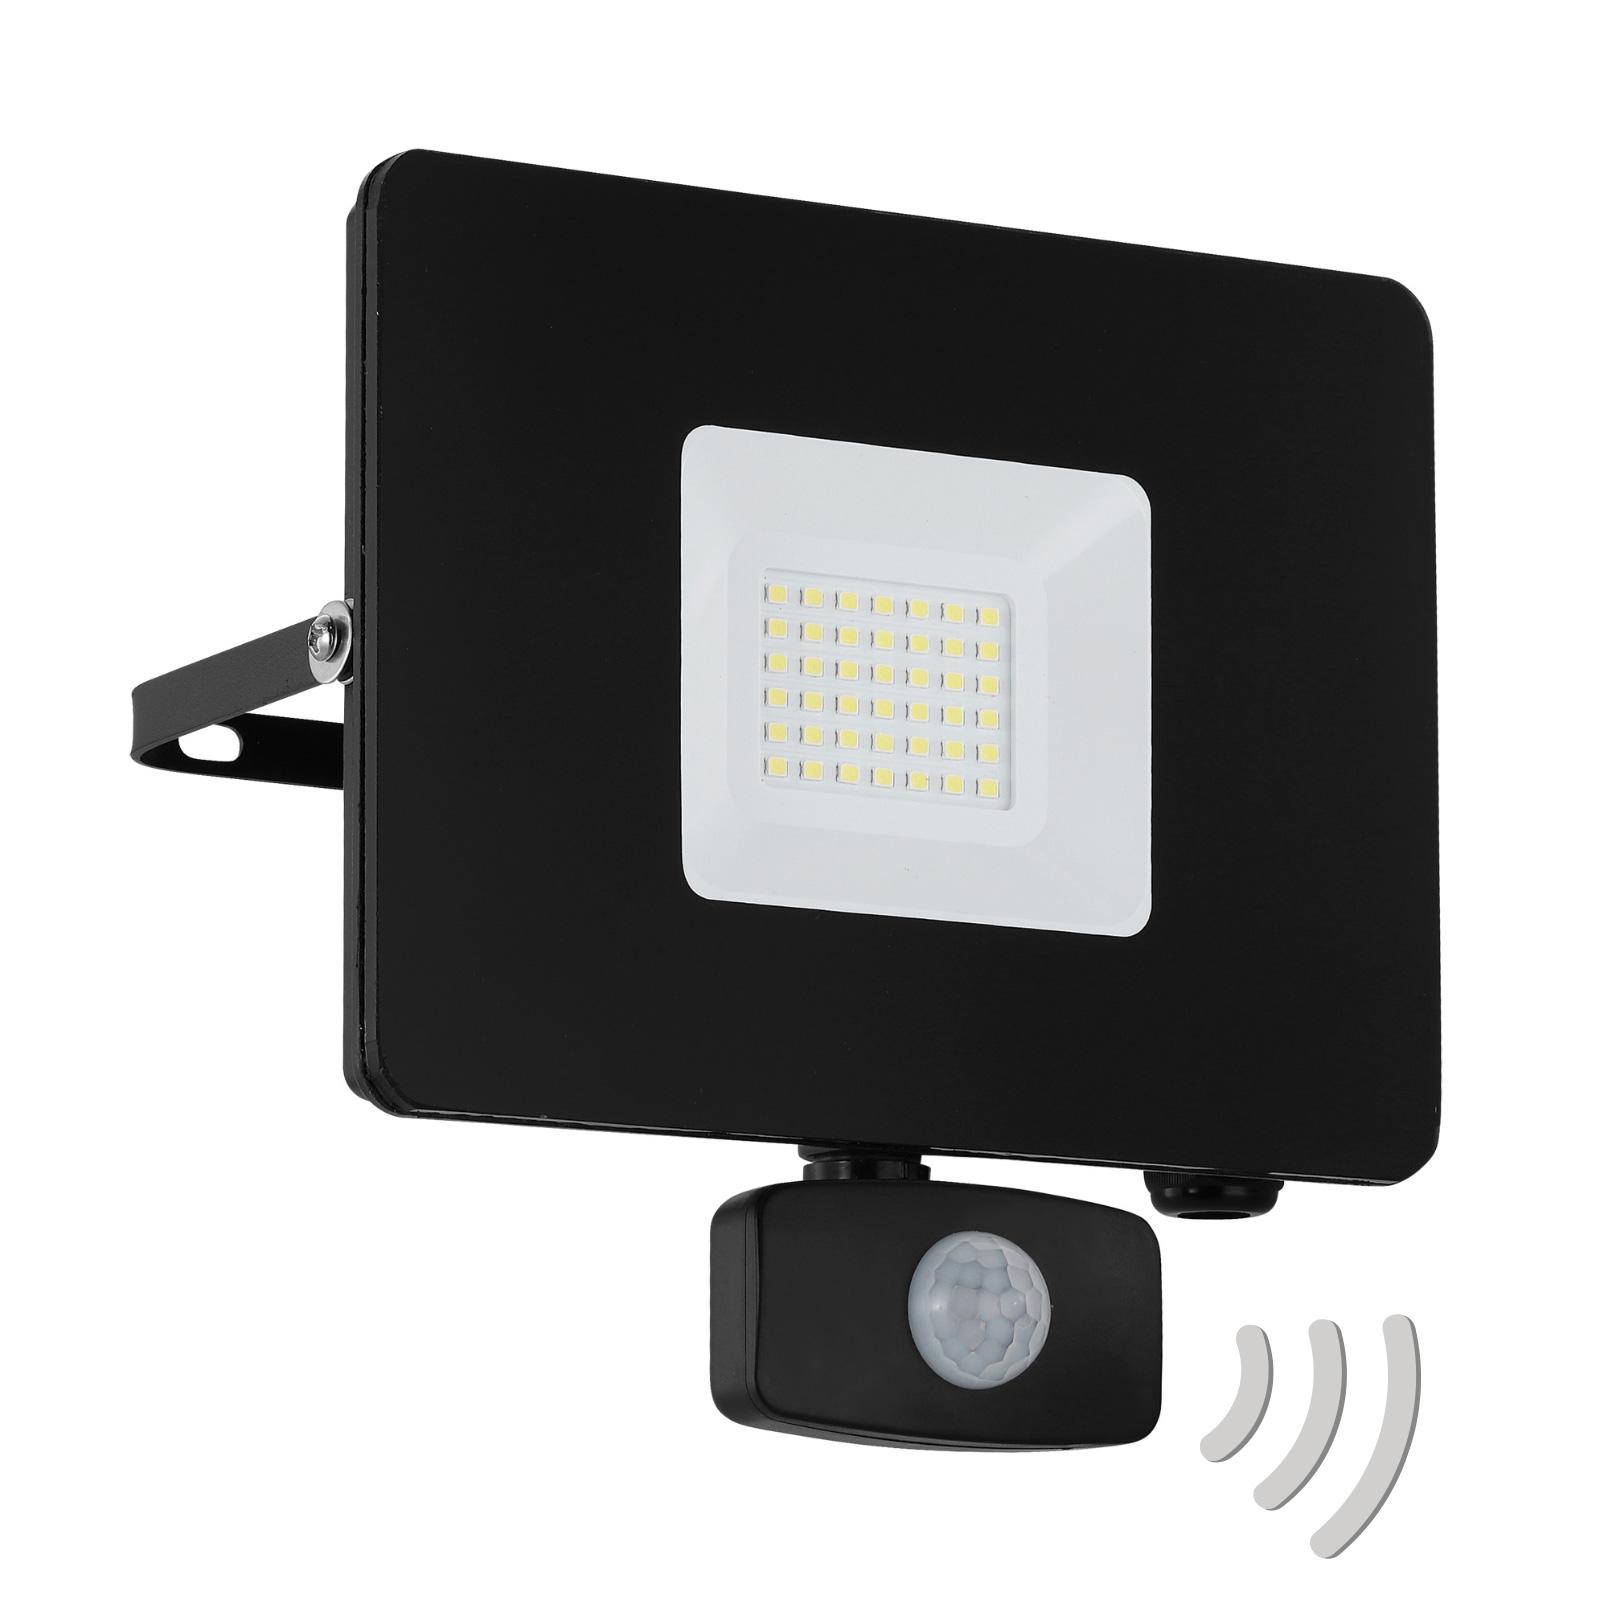 LED buitenspot Faedo 3 met sensor, zwart, 30W